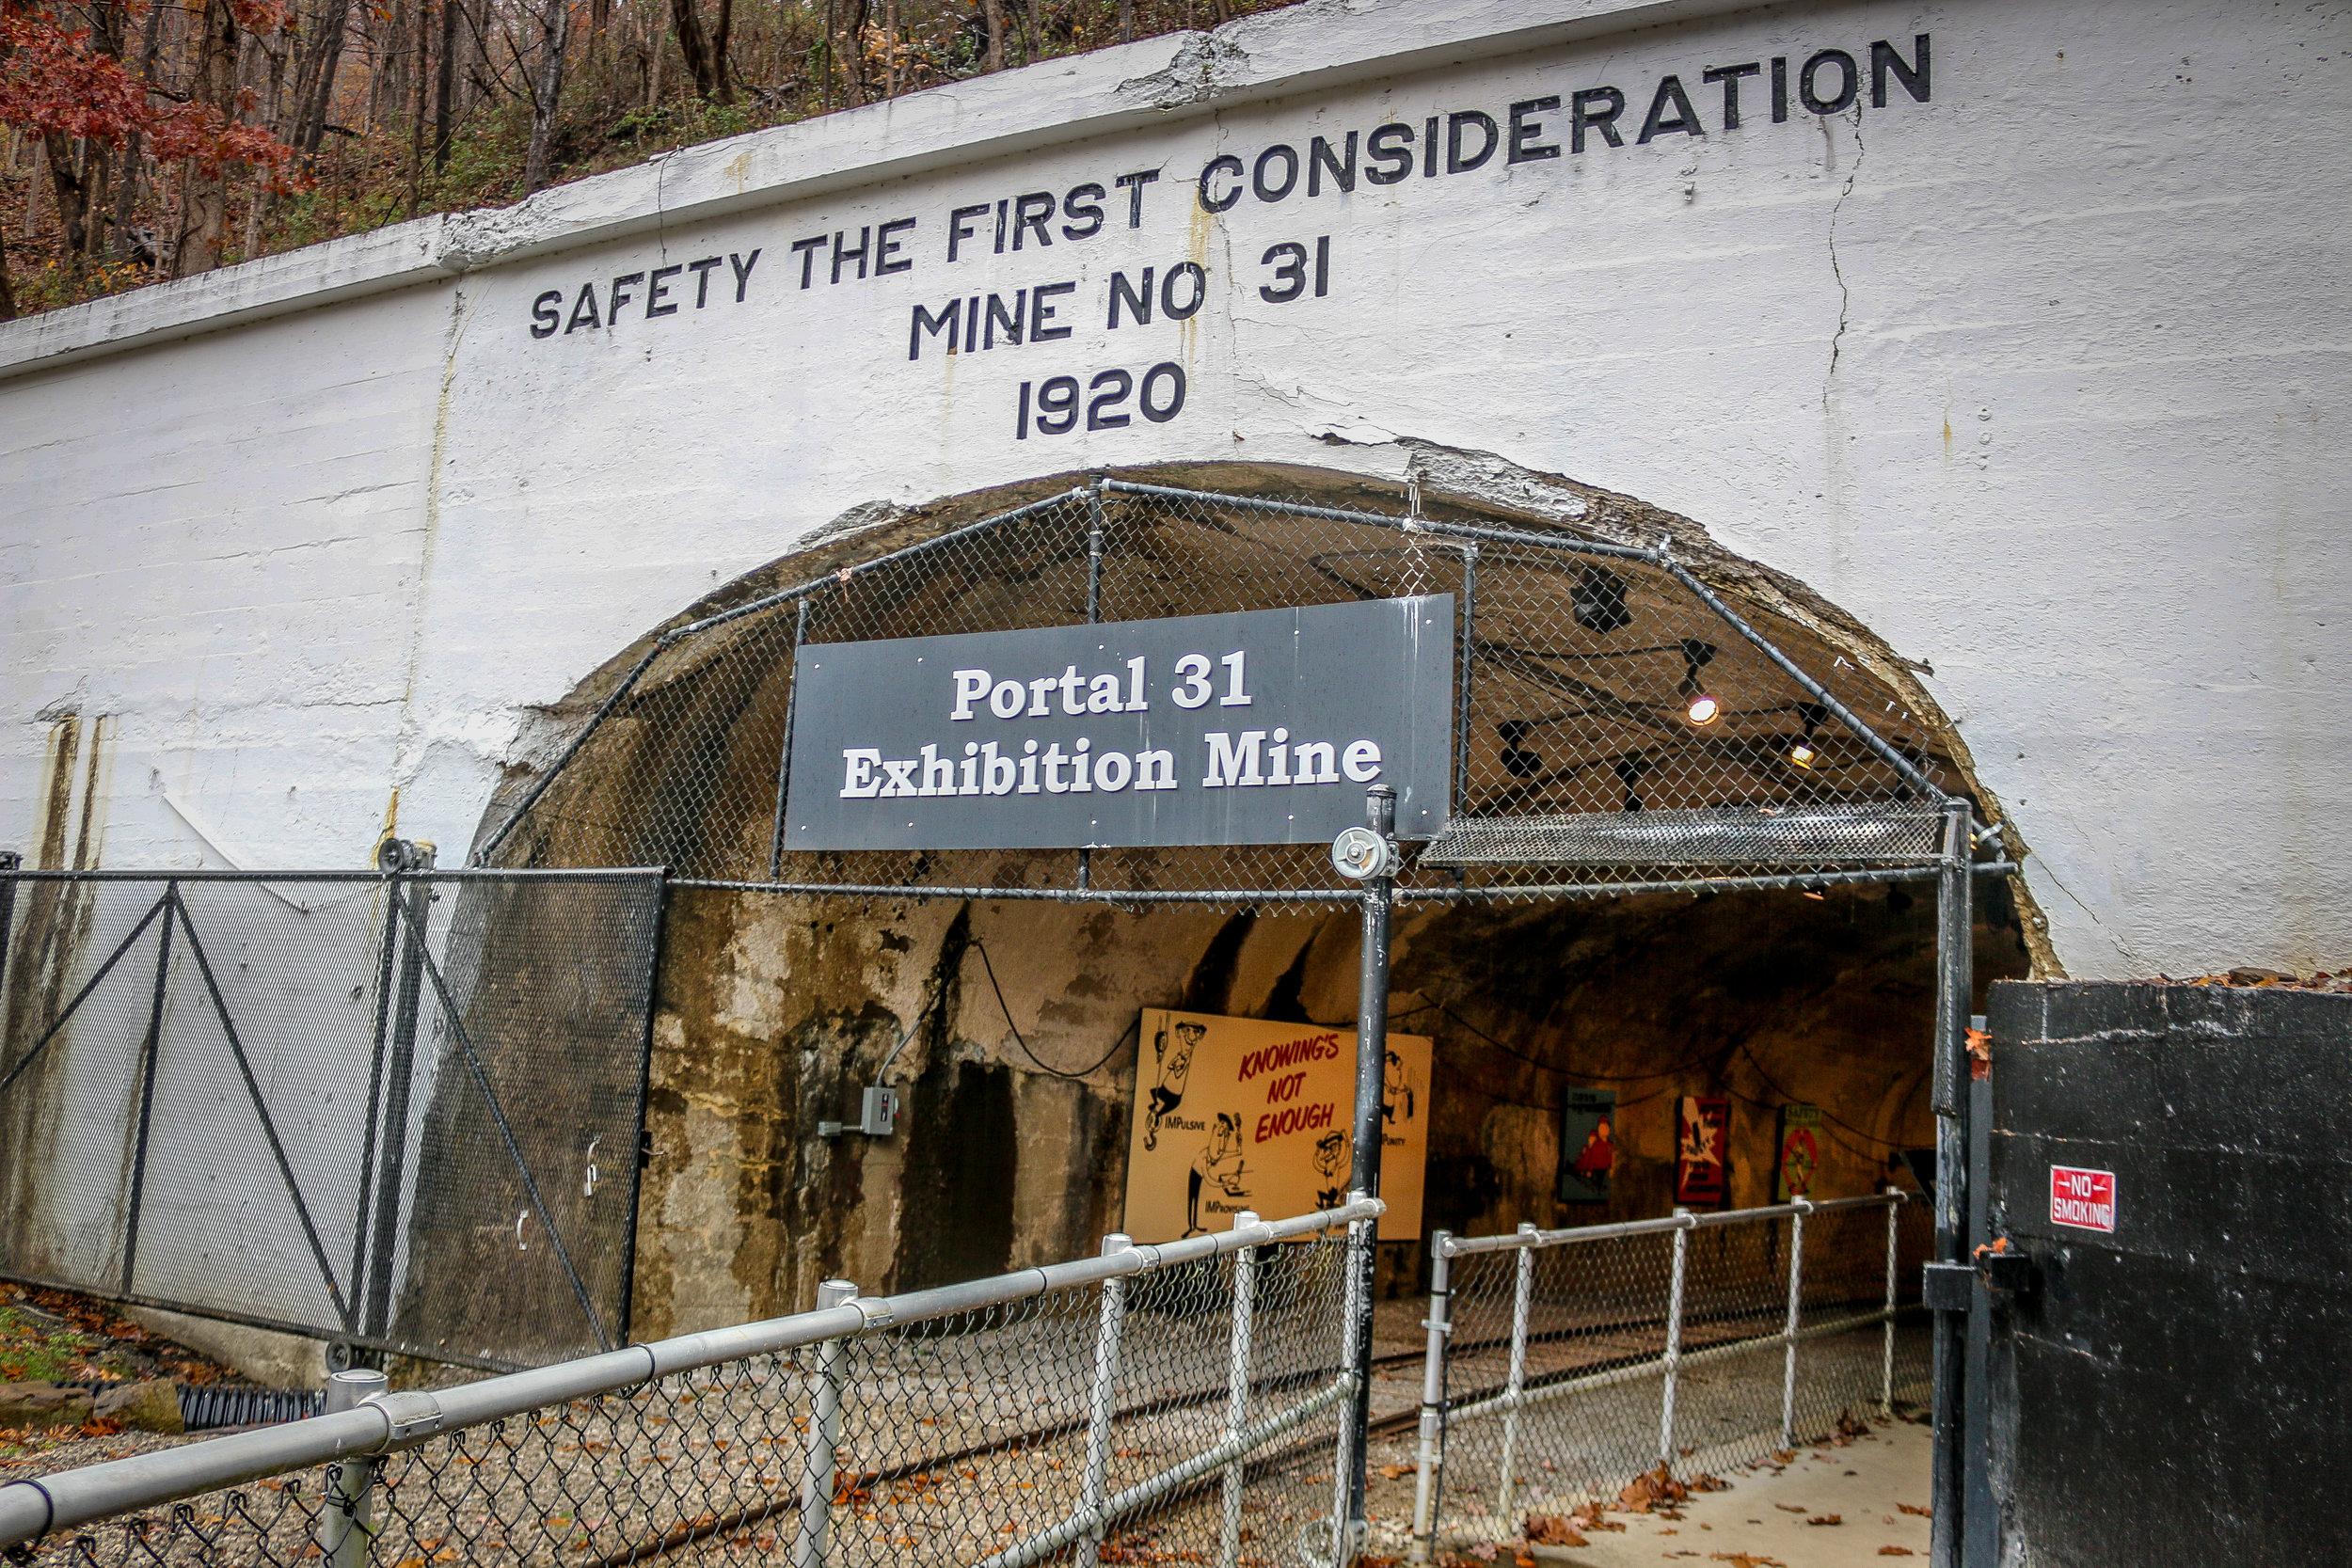 Portal 31 Mine - Takes You Underground!